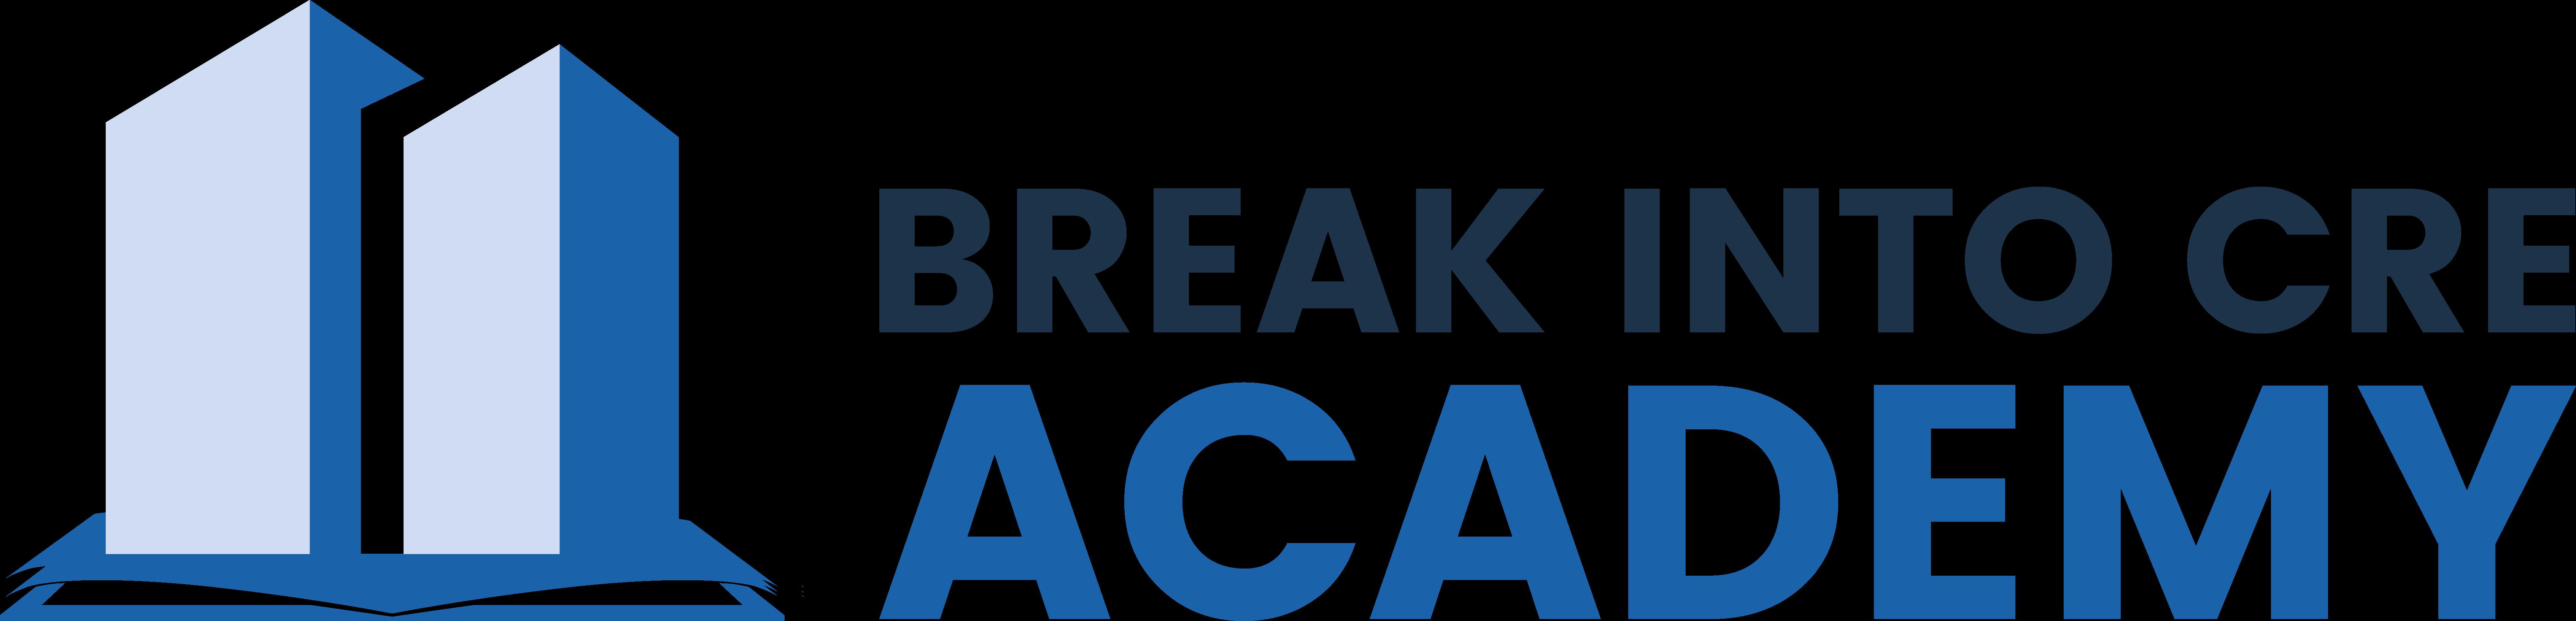 Break Into CRE Academy